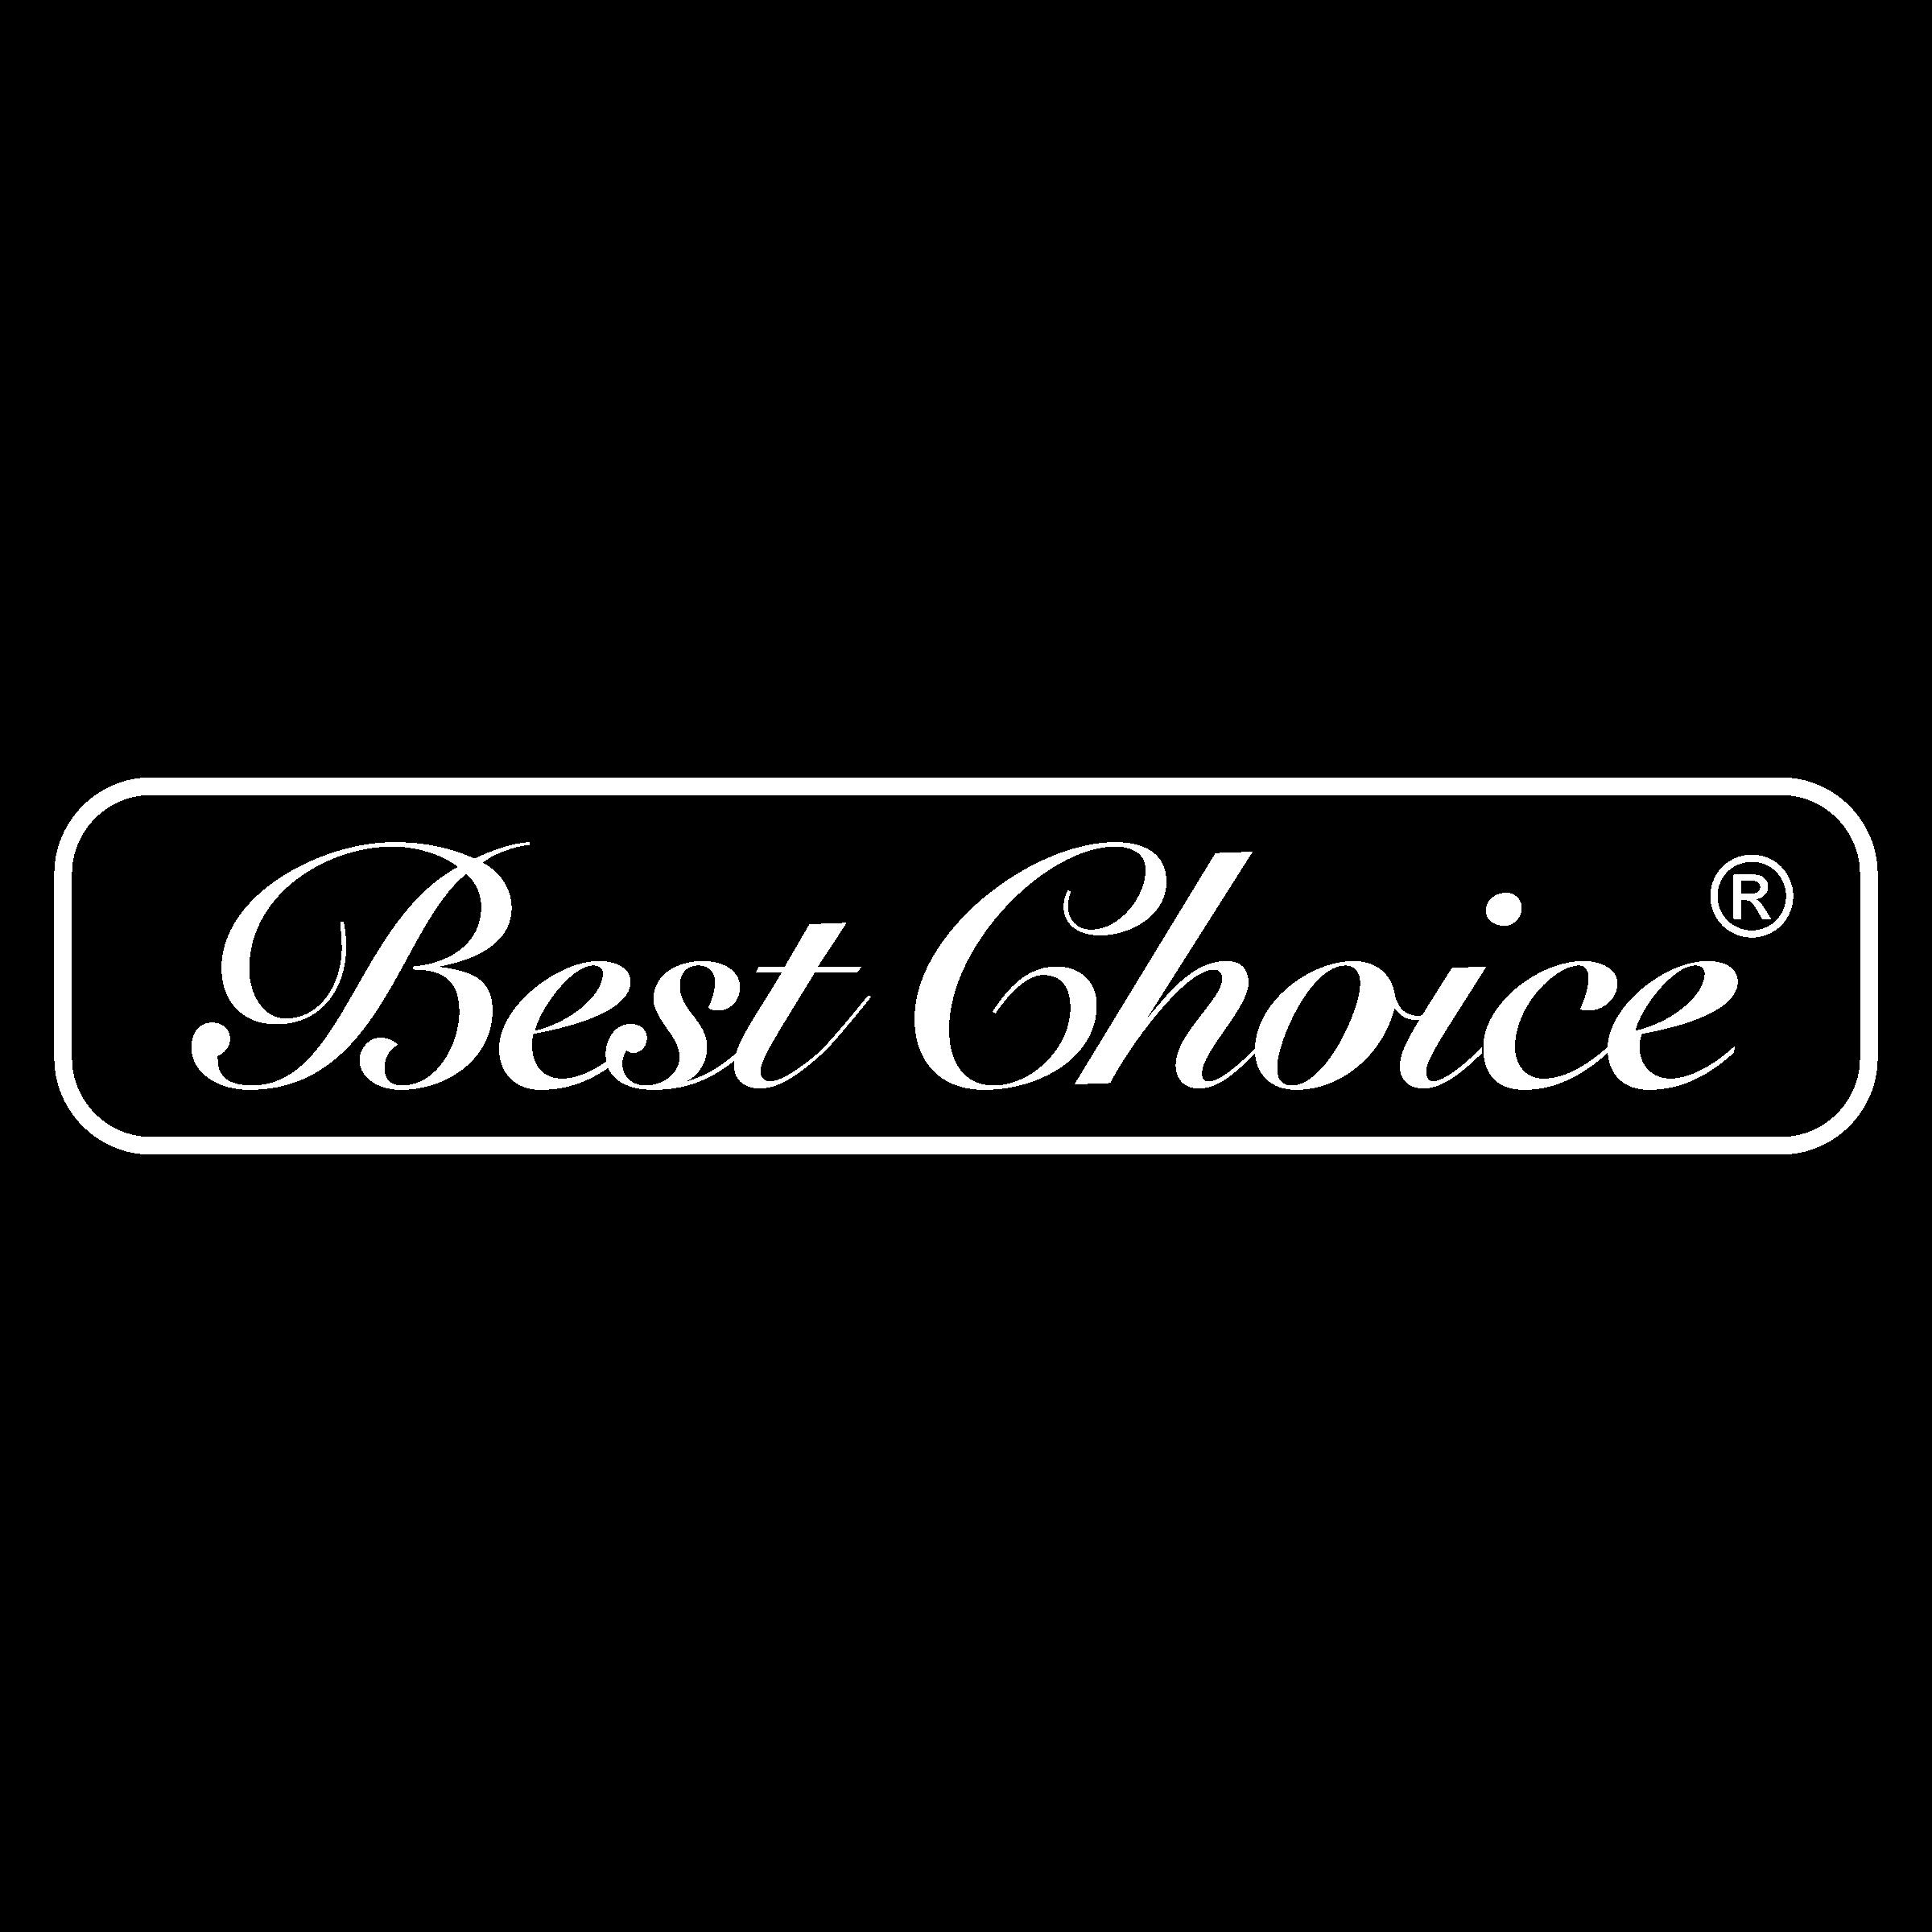 Best Choice 01 Logo PNG Transparent & SVG Vector